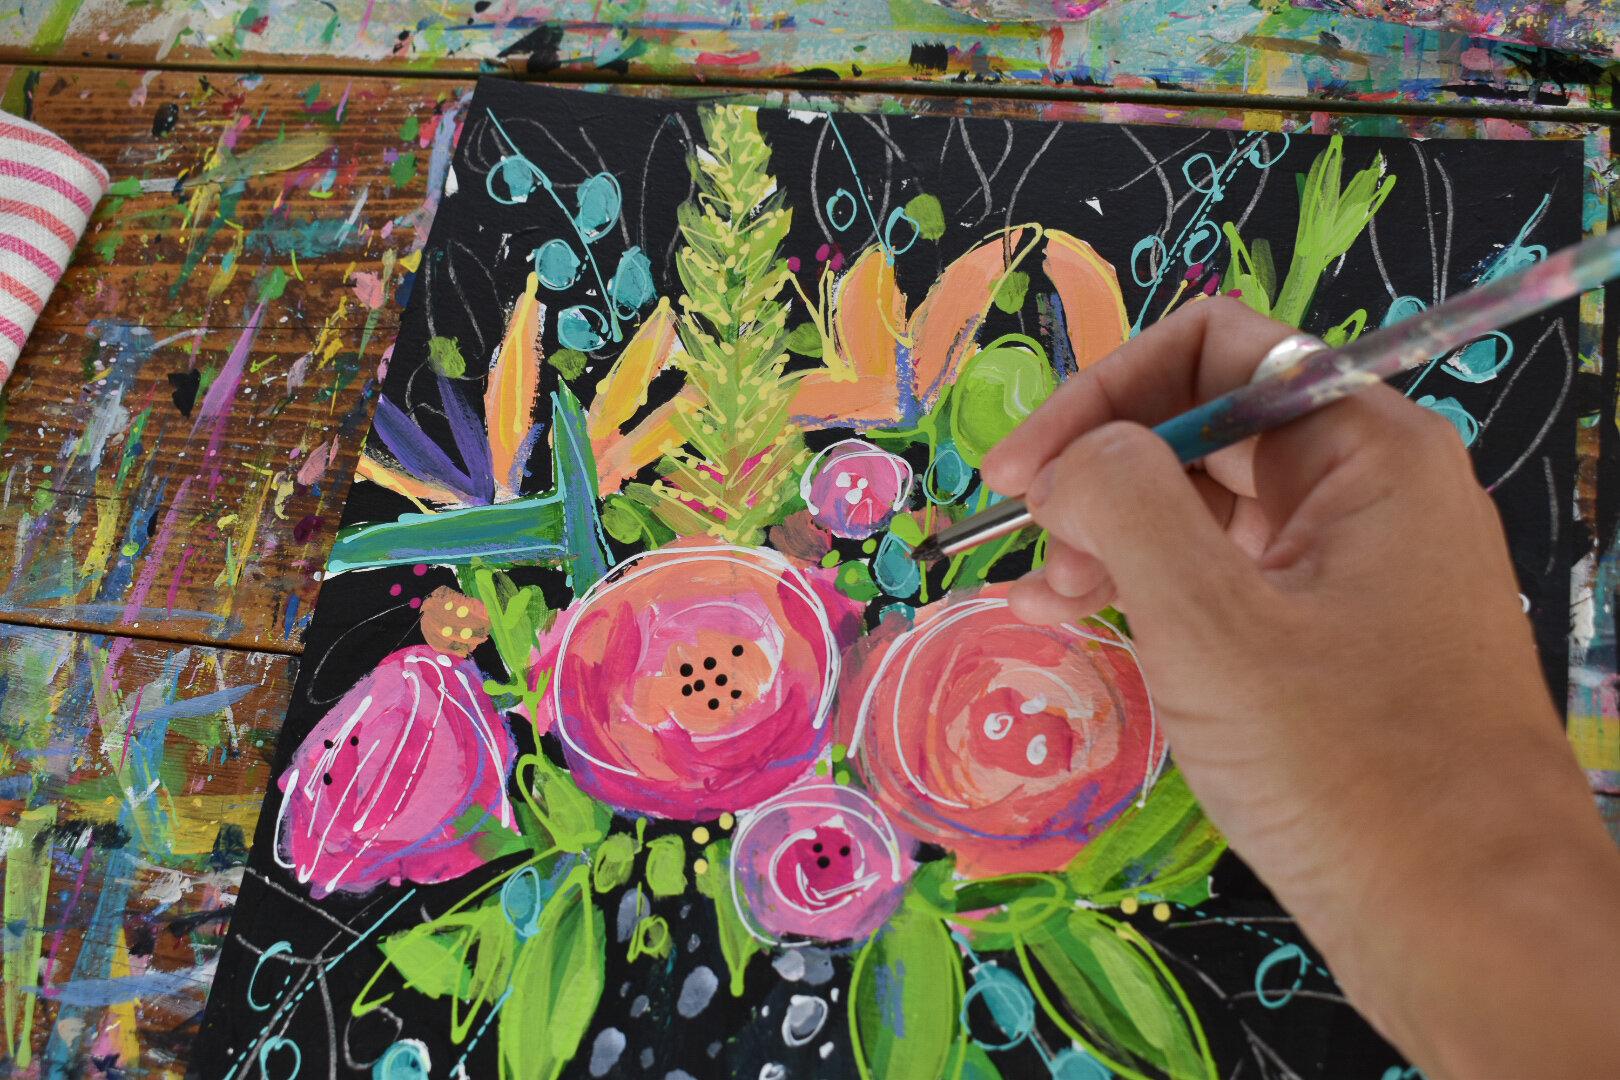 boho_painting_flowers_eclectic_daisyfaithart_5.jpg